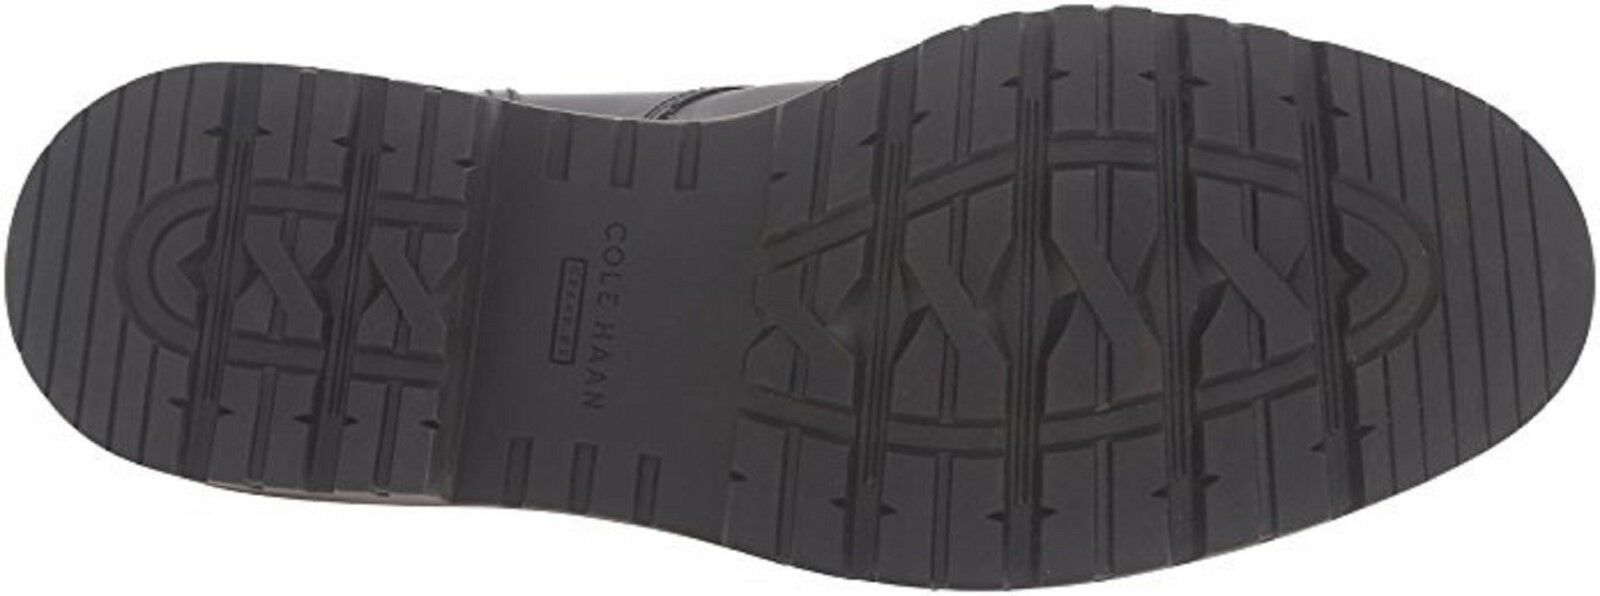 Cole Haan Men's Grantland Grantland Grantland 6 inch Lace up Ankle Boots Black WATERPROOF 8.5 NEW 78db9c